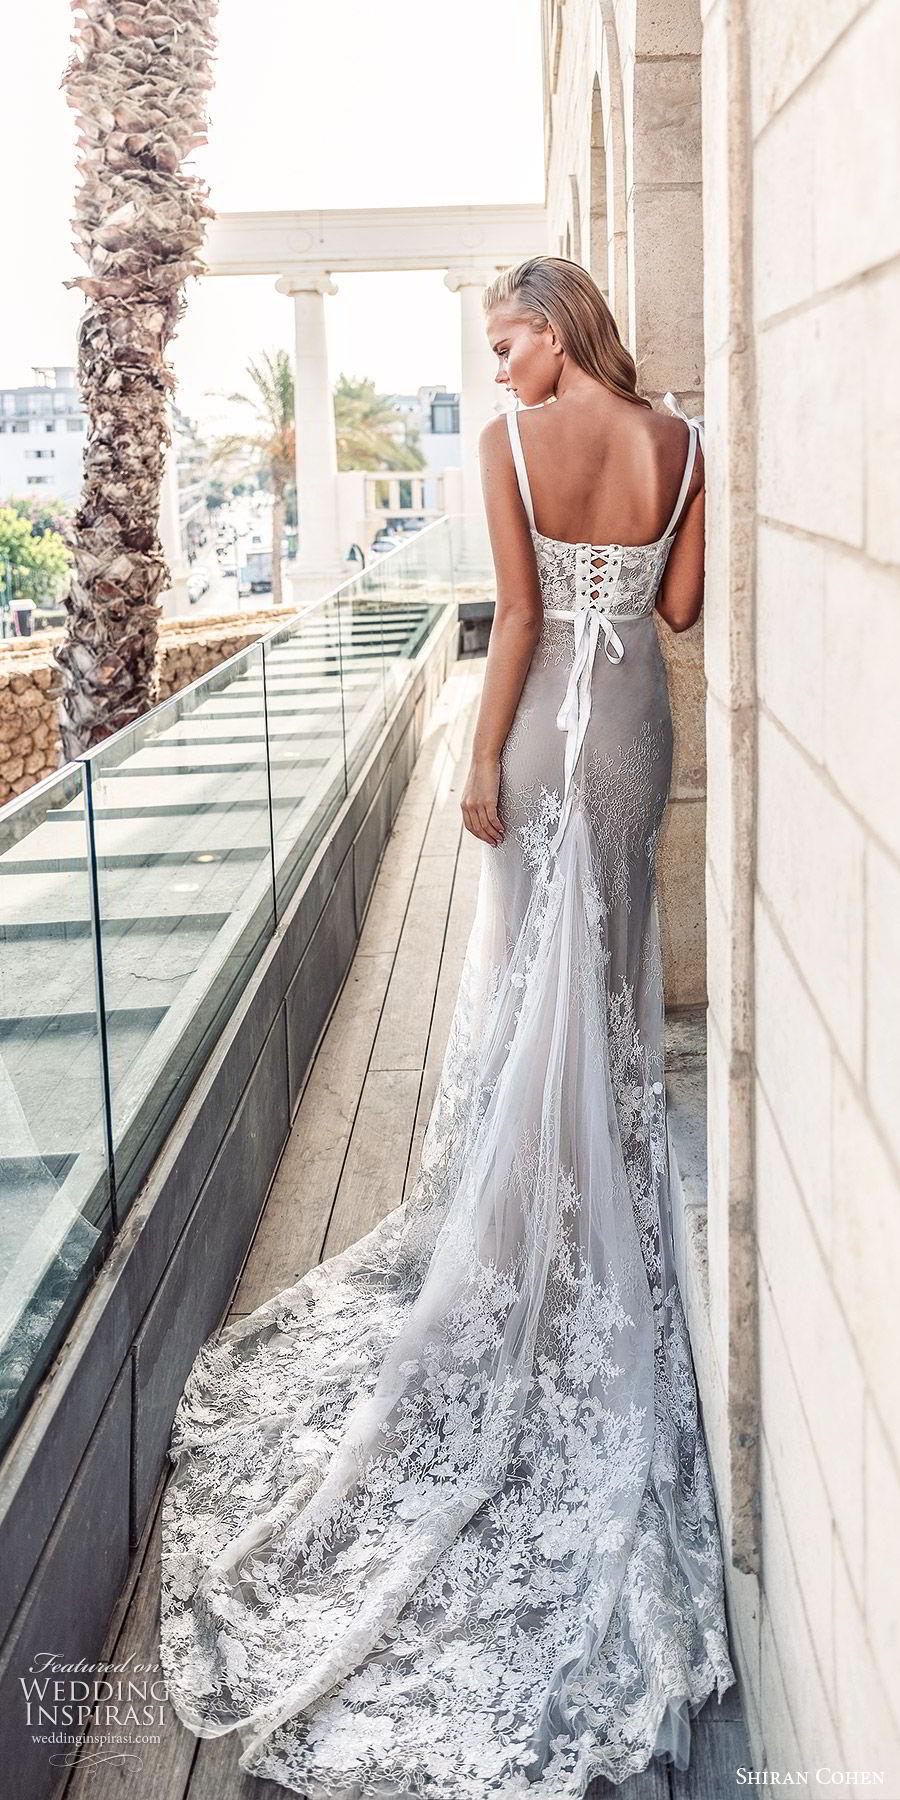 shiran cohen 2019 bridal sleeveless thick straps semi sweetheart neckline lace bodice sheath mermaid wedding dress chapel train corset back romantic elegant (2) bv